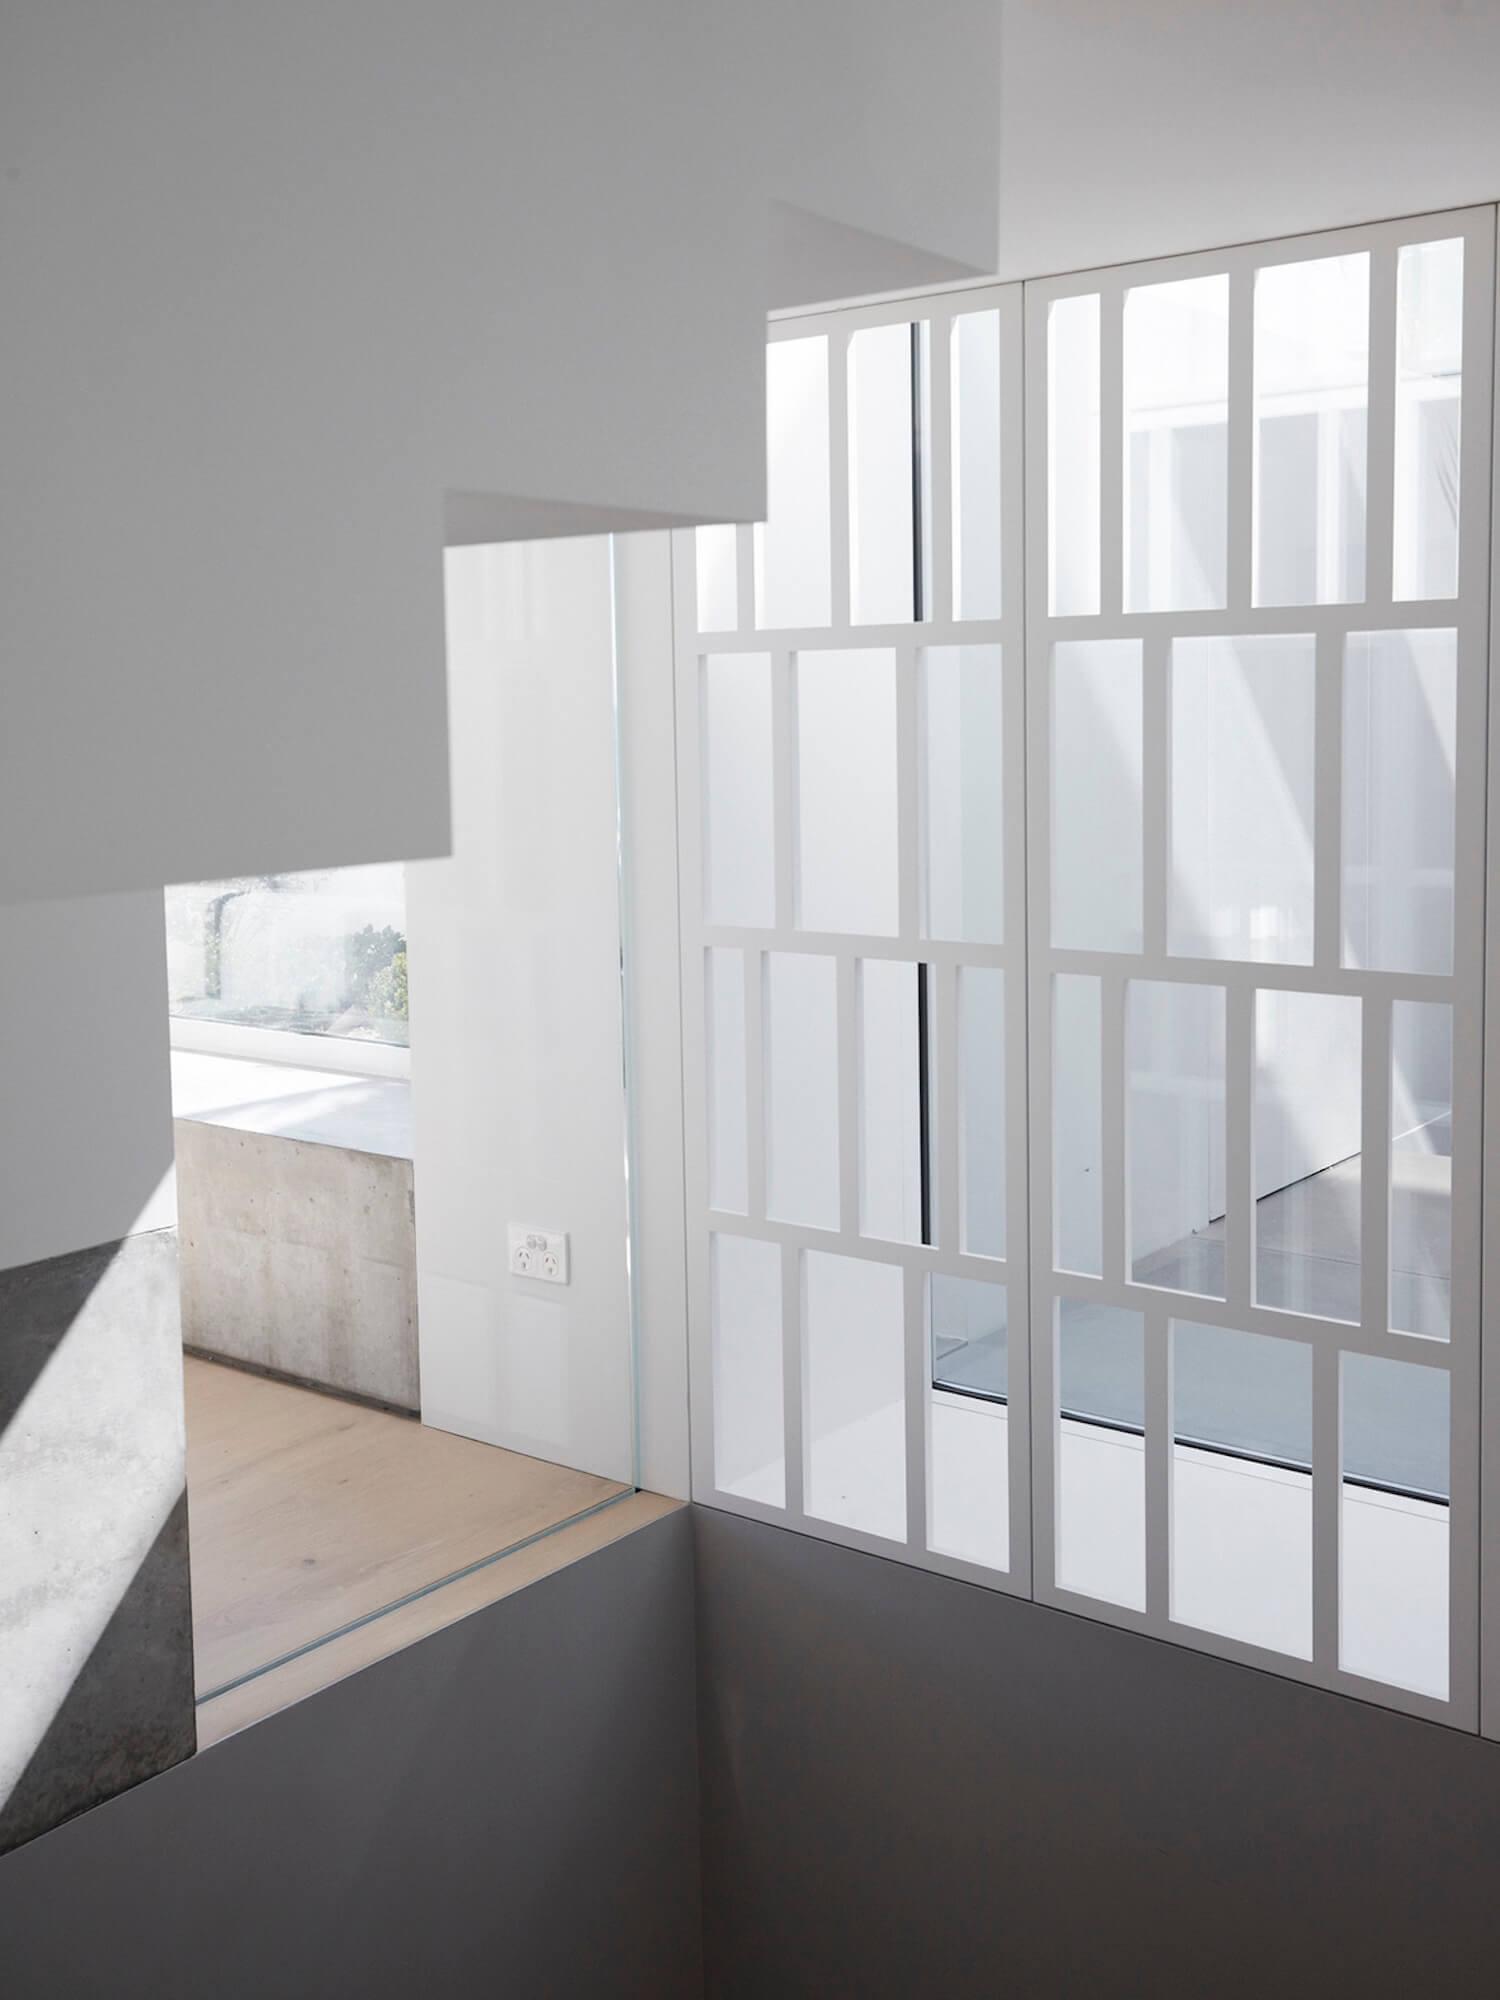 est living clovelly house II madeleine blanchfield architects 2